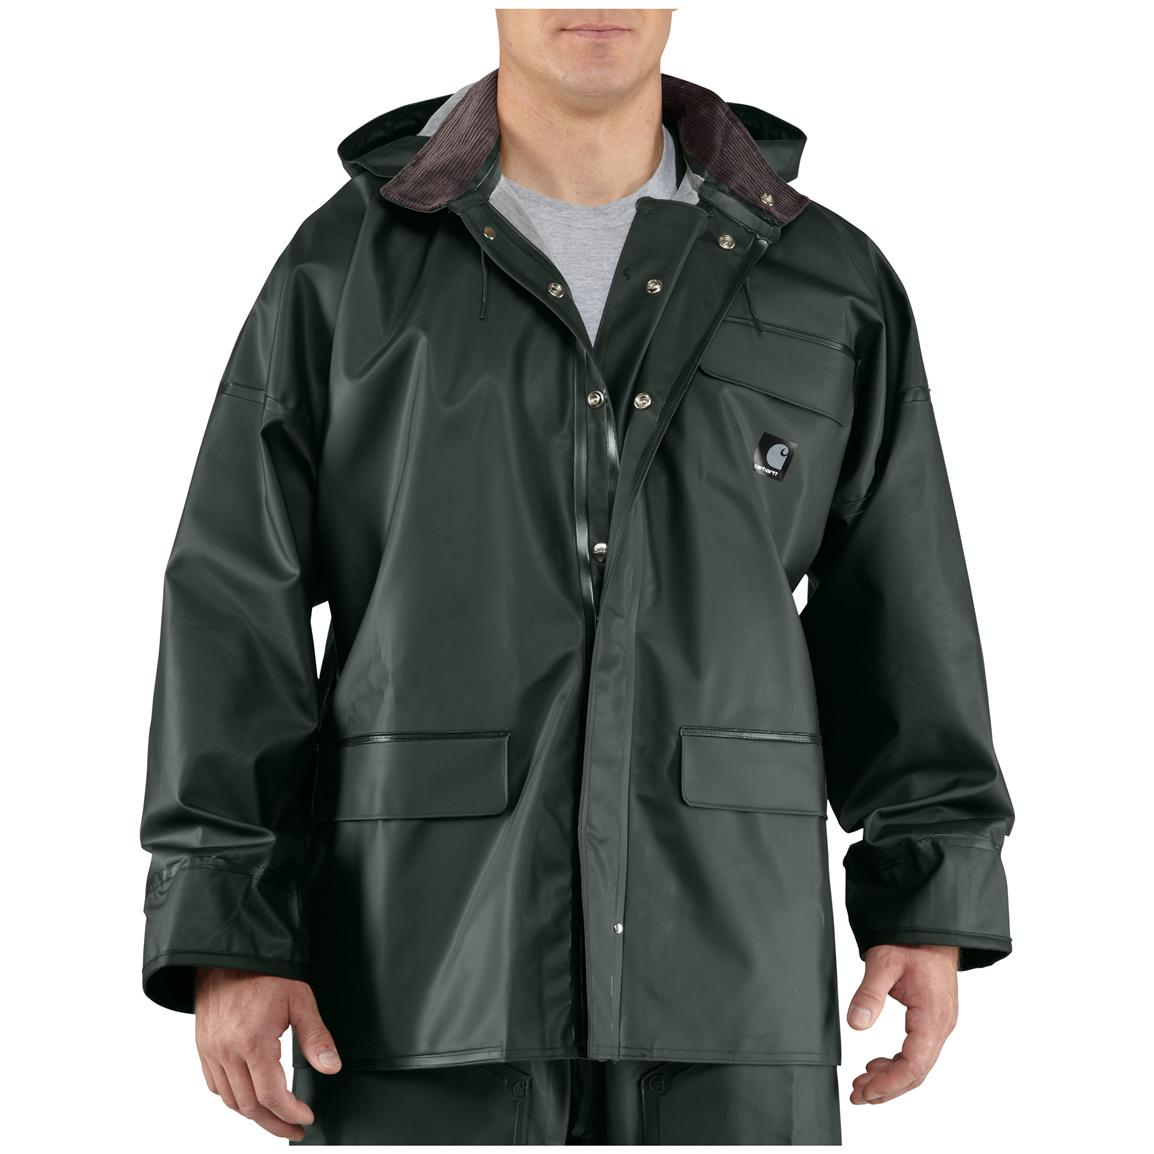 rain jackets for men menu0027s carhartt® surrey waterproof hooded rain coat, green bcsvmtp